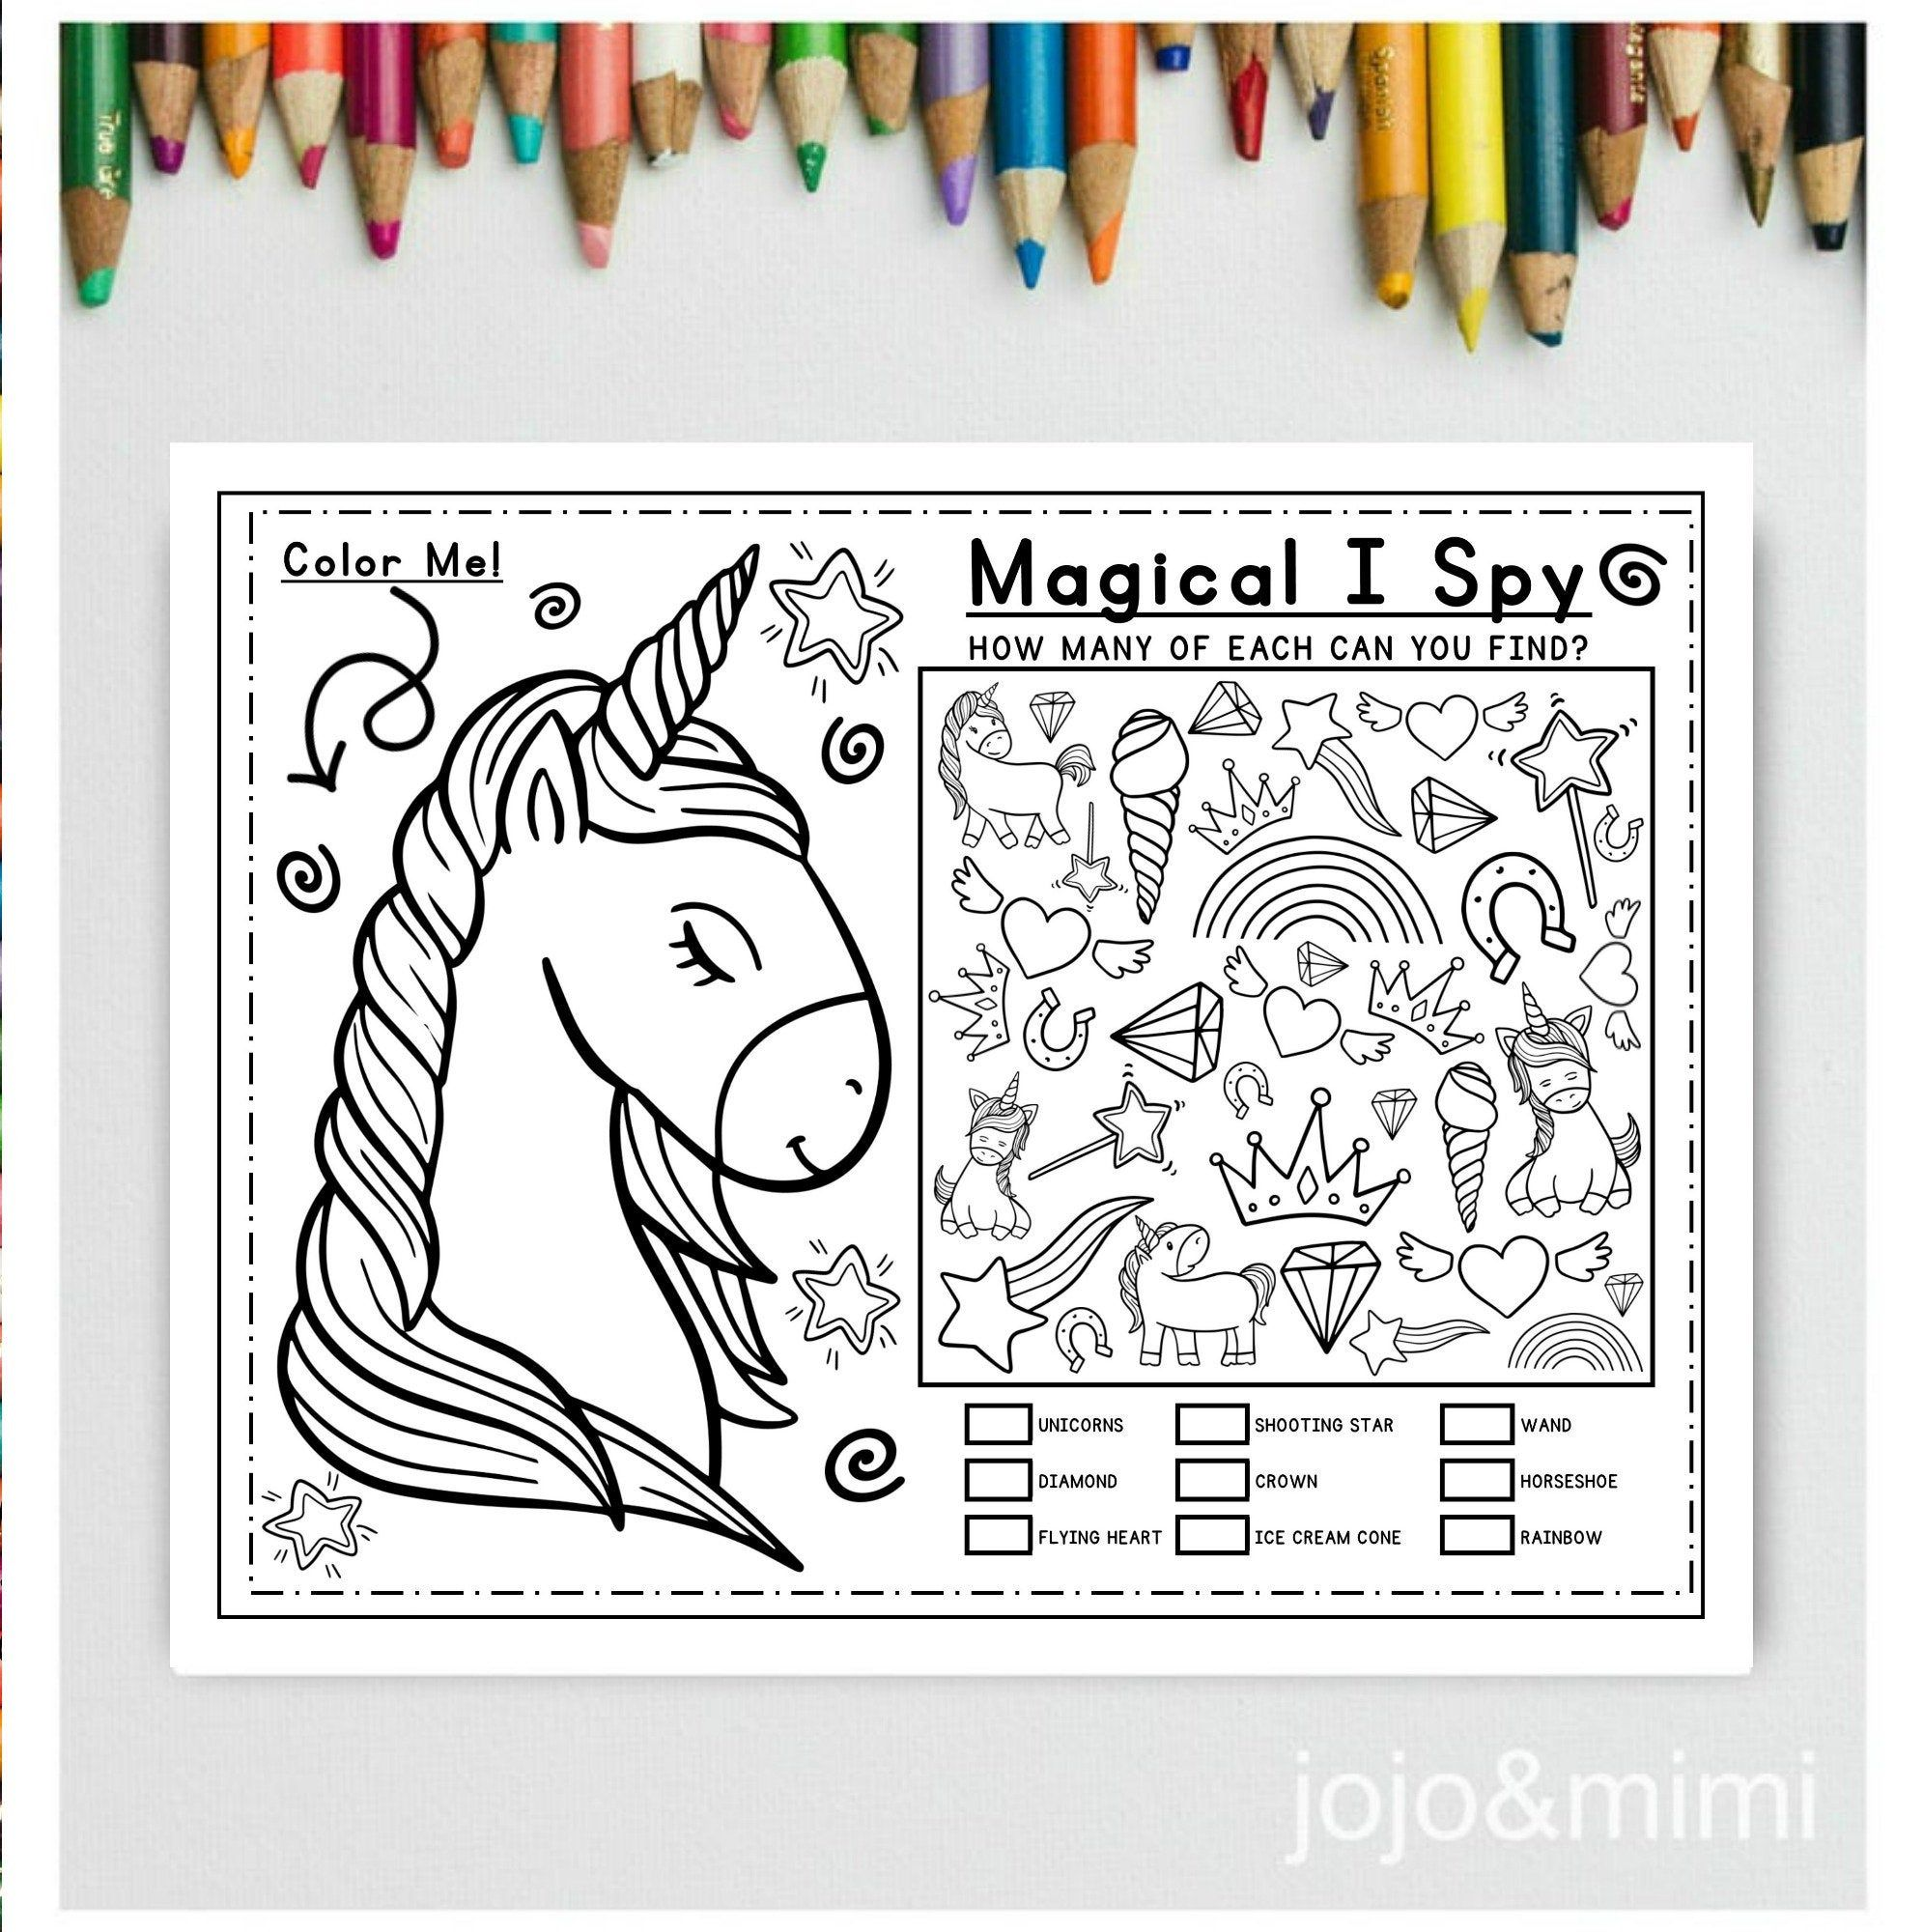 Unicorn Activity Coloring Page Magical I Spy Printable Activity Unicorn Birthday Party Placemat Birthday Game Unicorn Party Activity Game In 2020 Unicorn Coloring Pages Coloring Pages Business For Kids